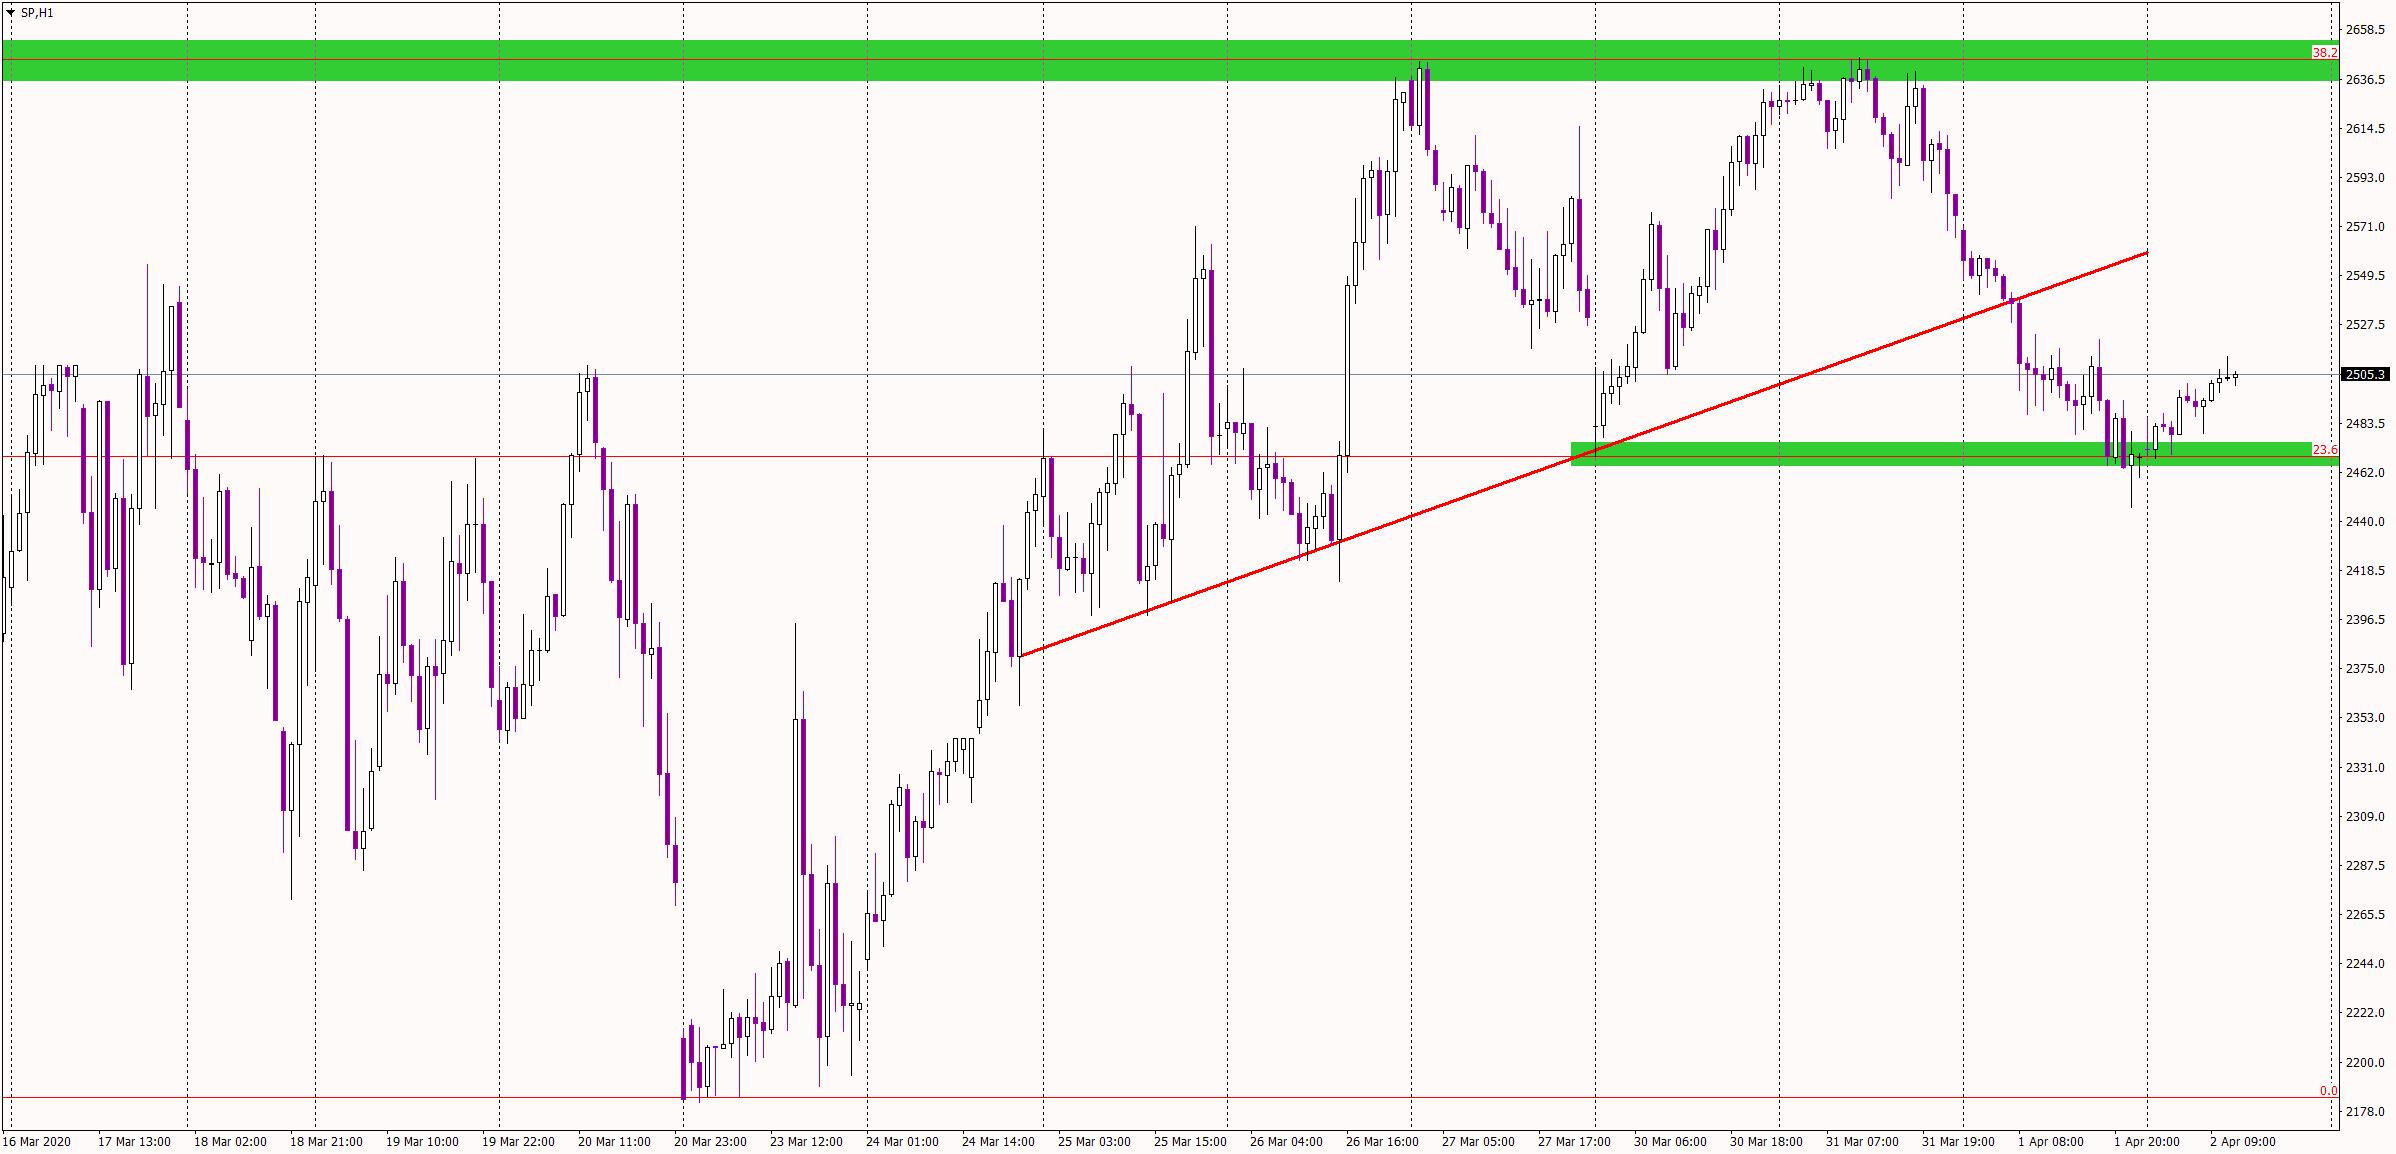 S&P 500 1 hour chart